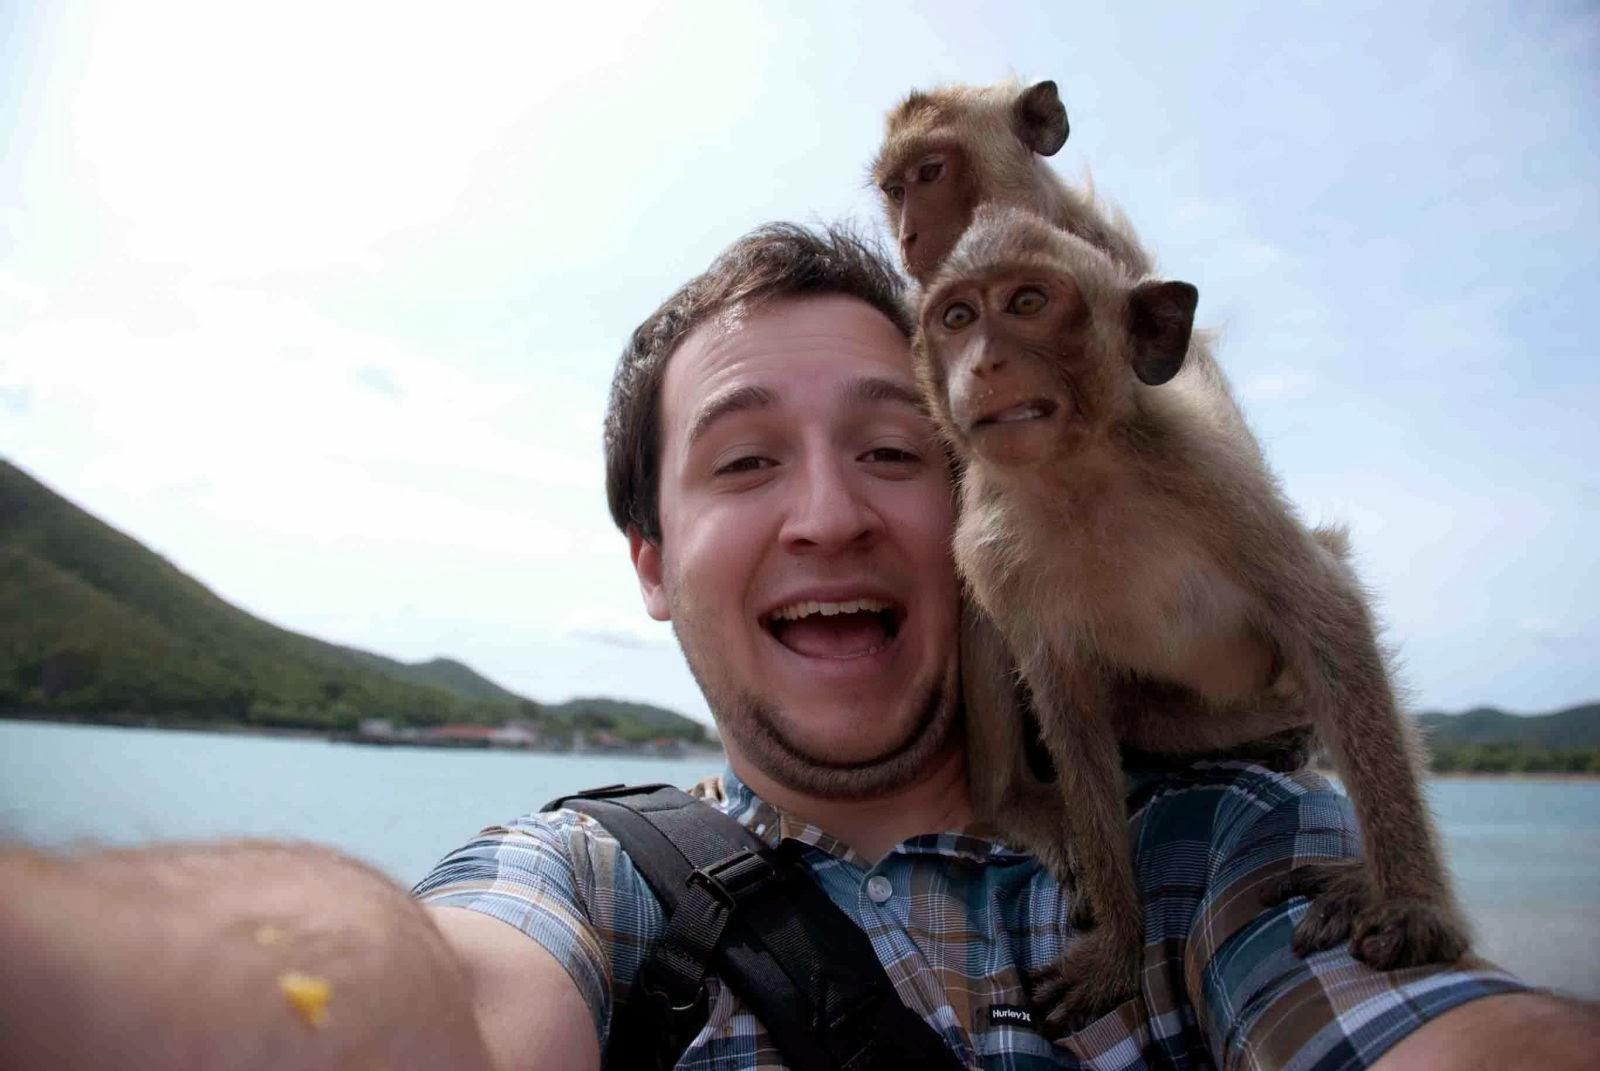 funny-animal-selfie-032